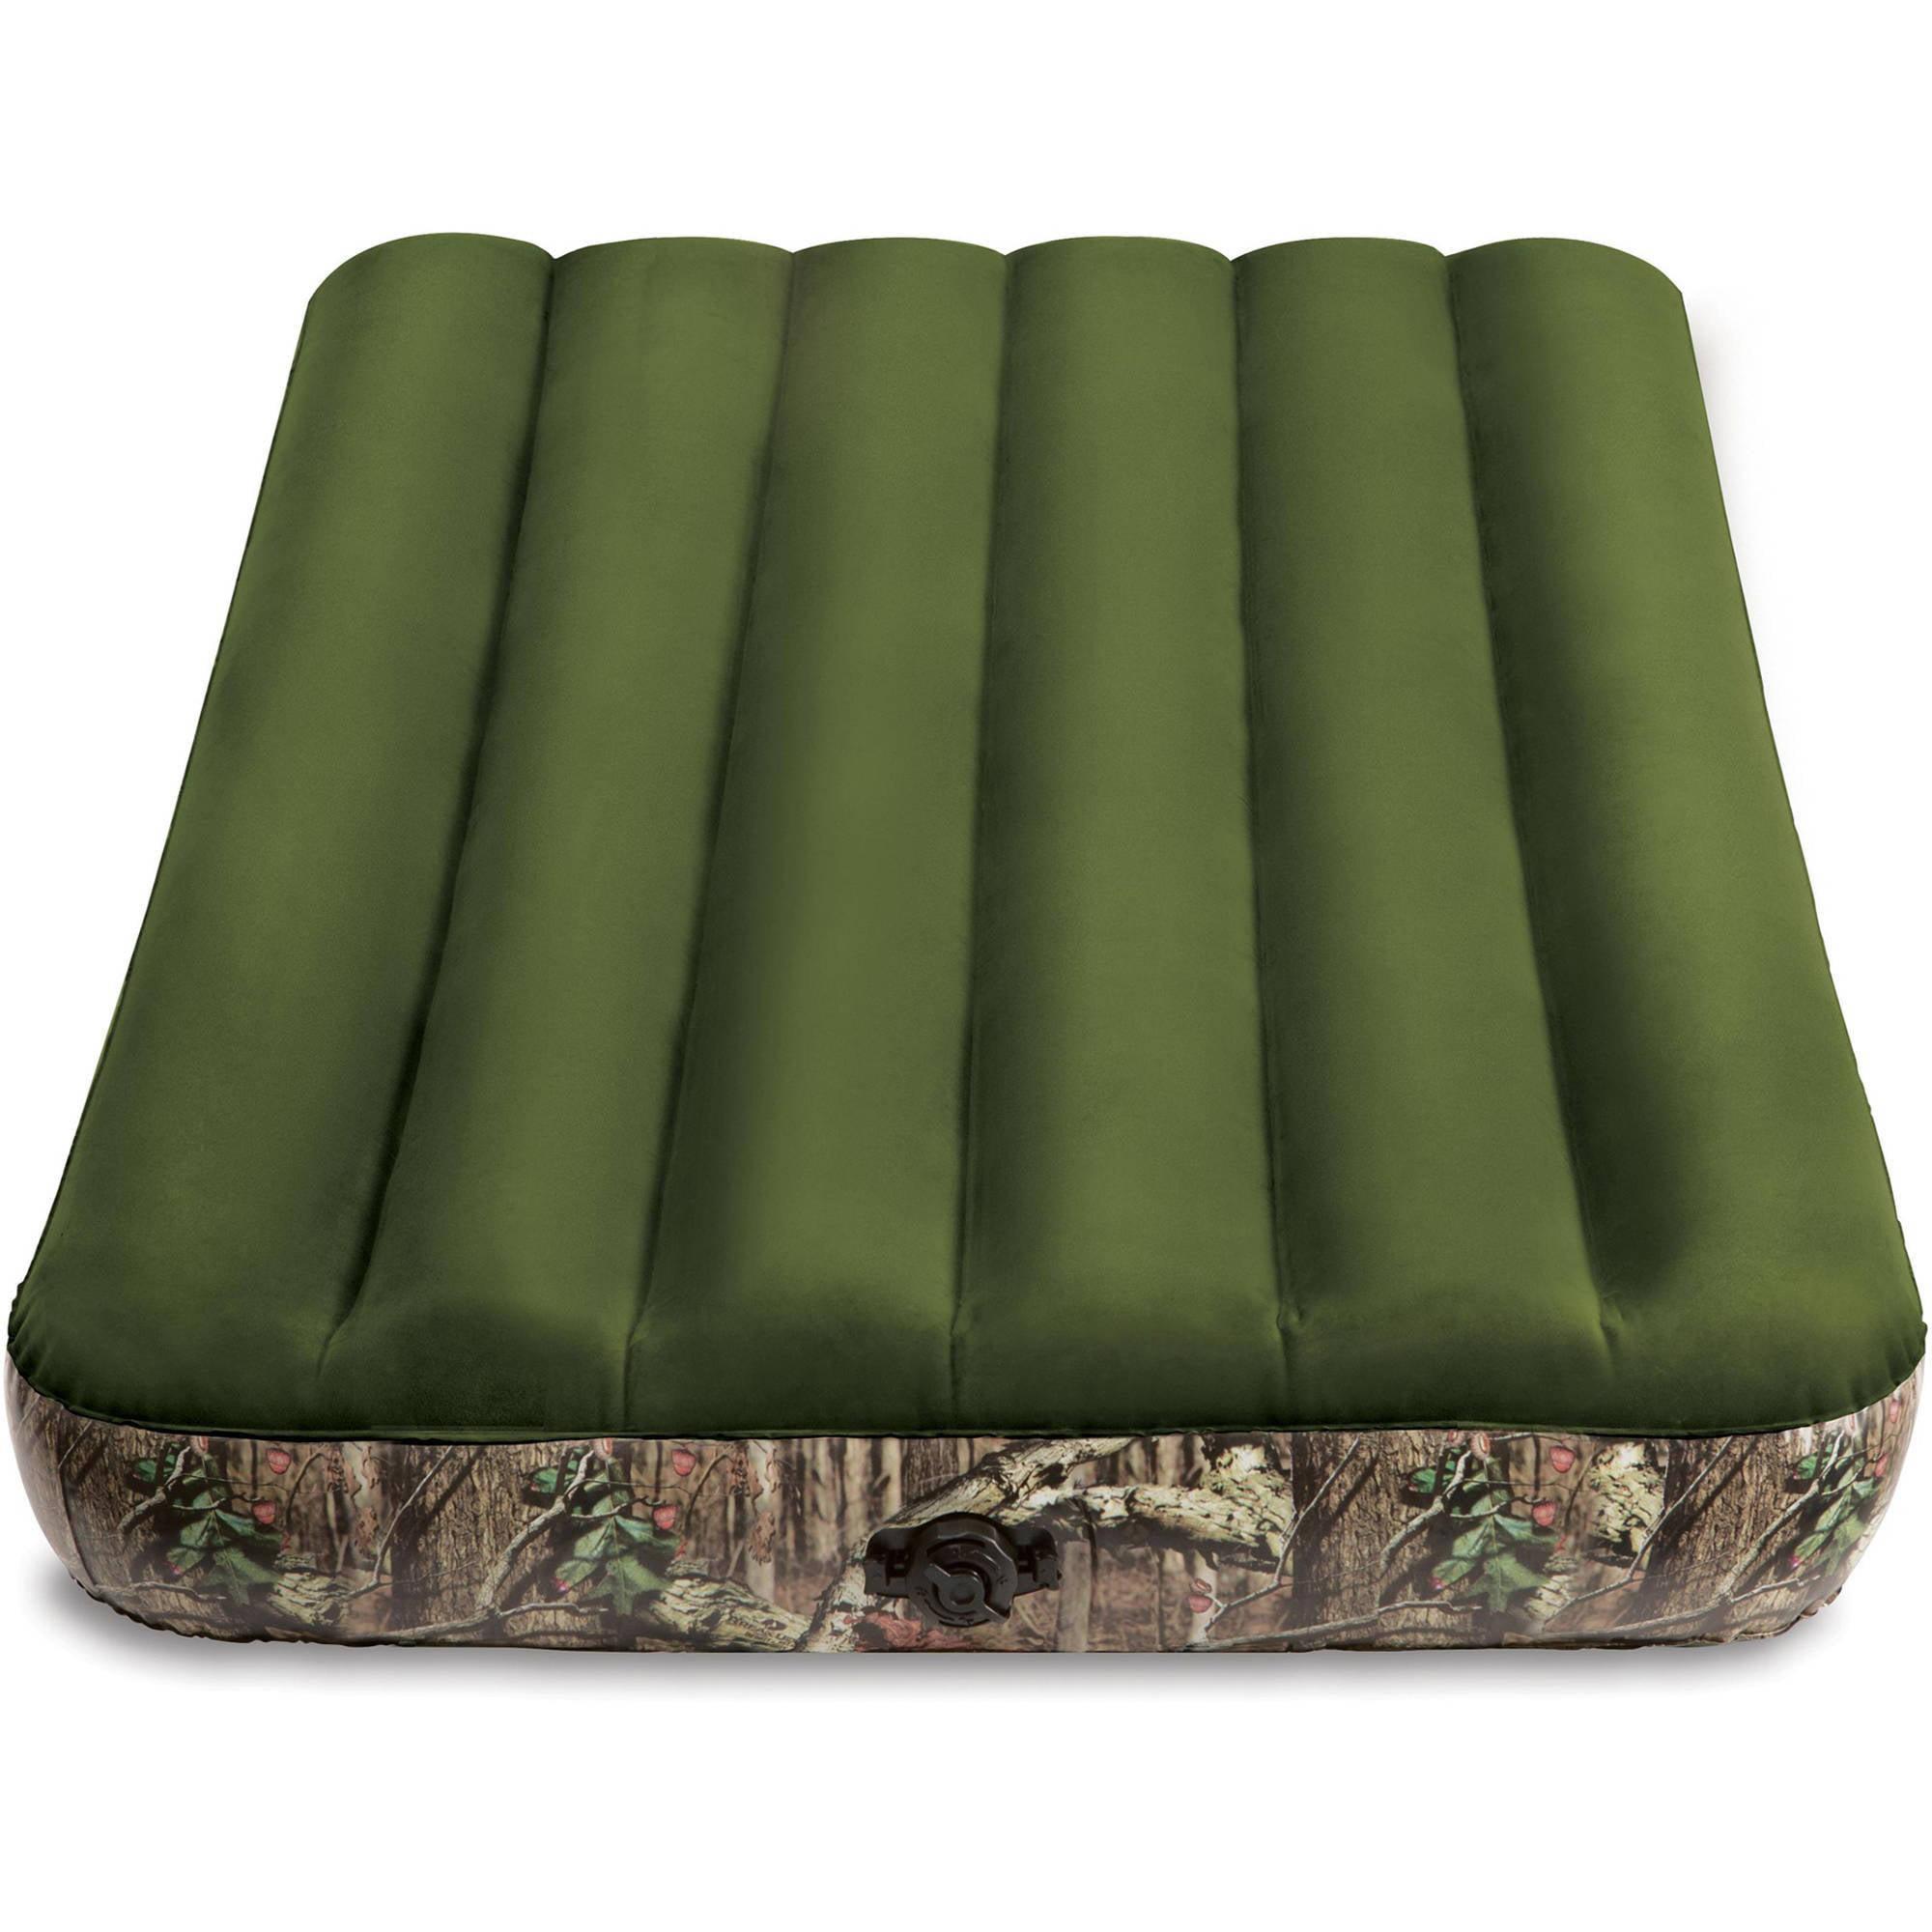 for replacement sleeper reviews rooms rv boy go vs lazy sofa mattressiews to air inspirational dream mattress